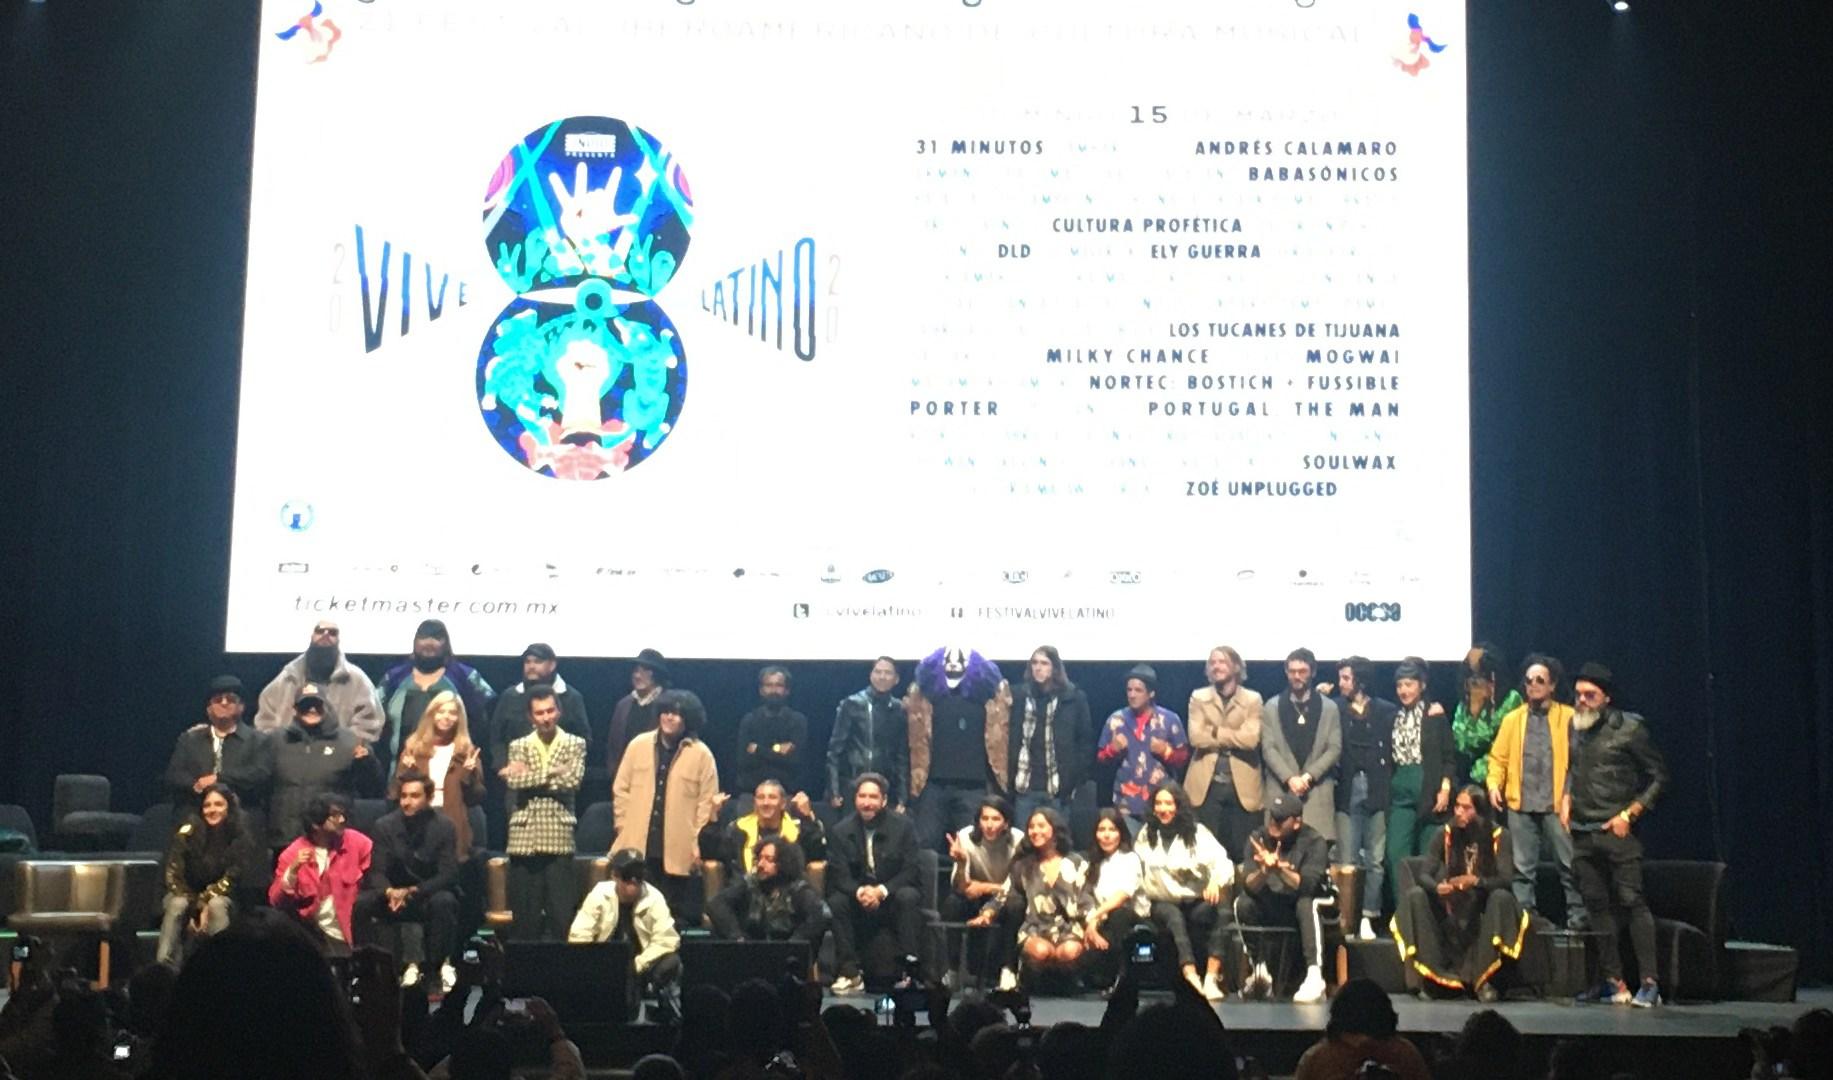 Sustentable, nuevo lema del Vive Latino